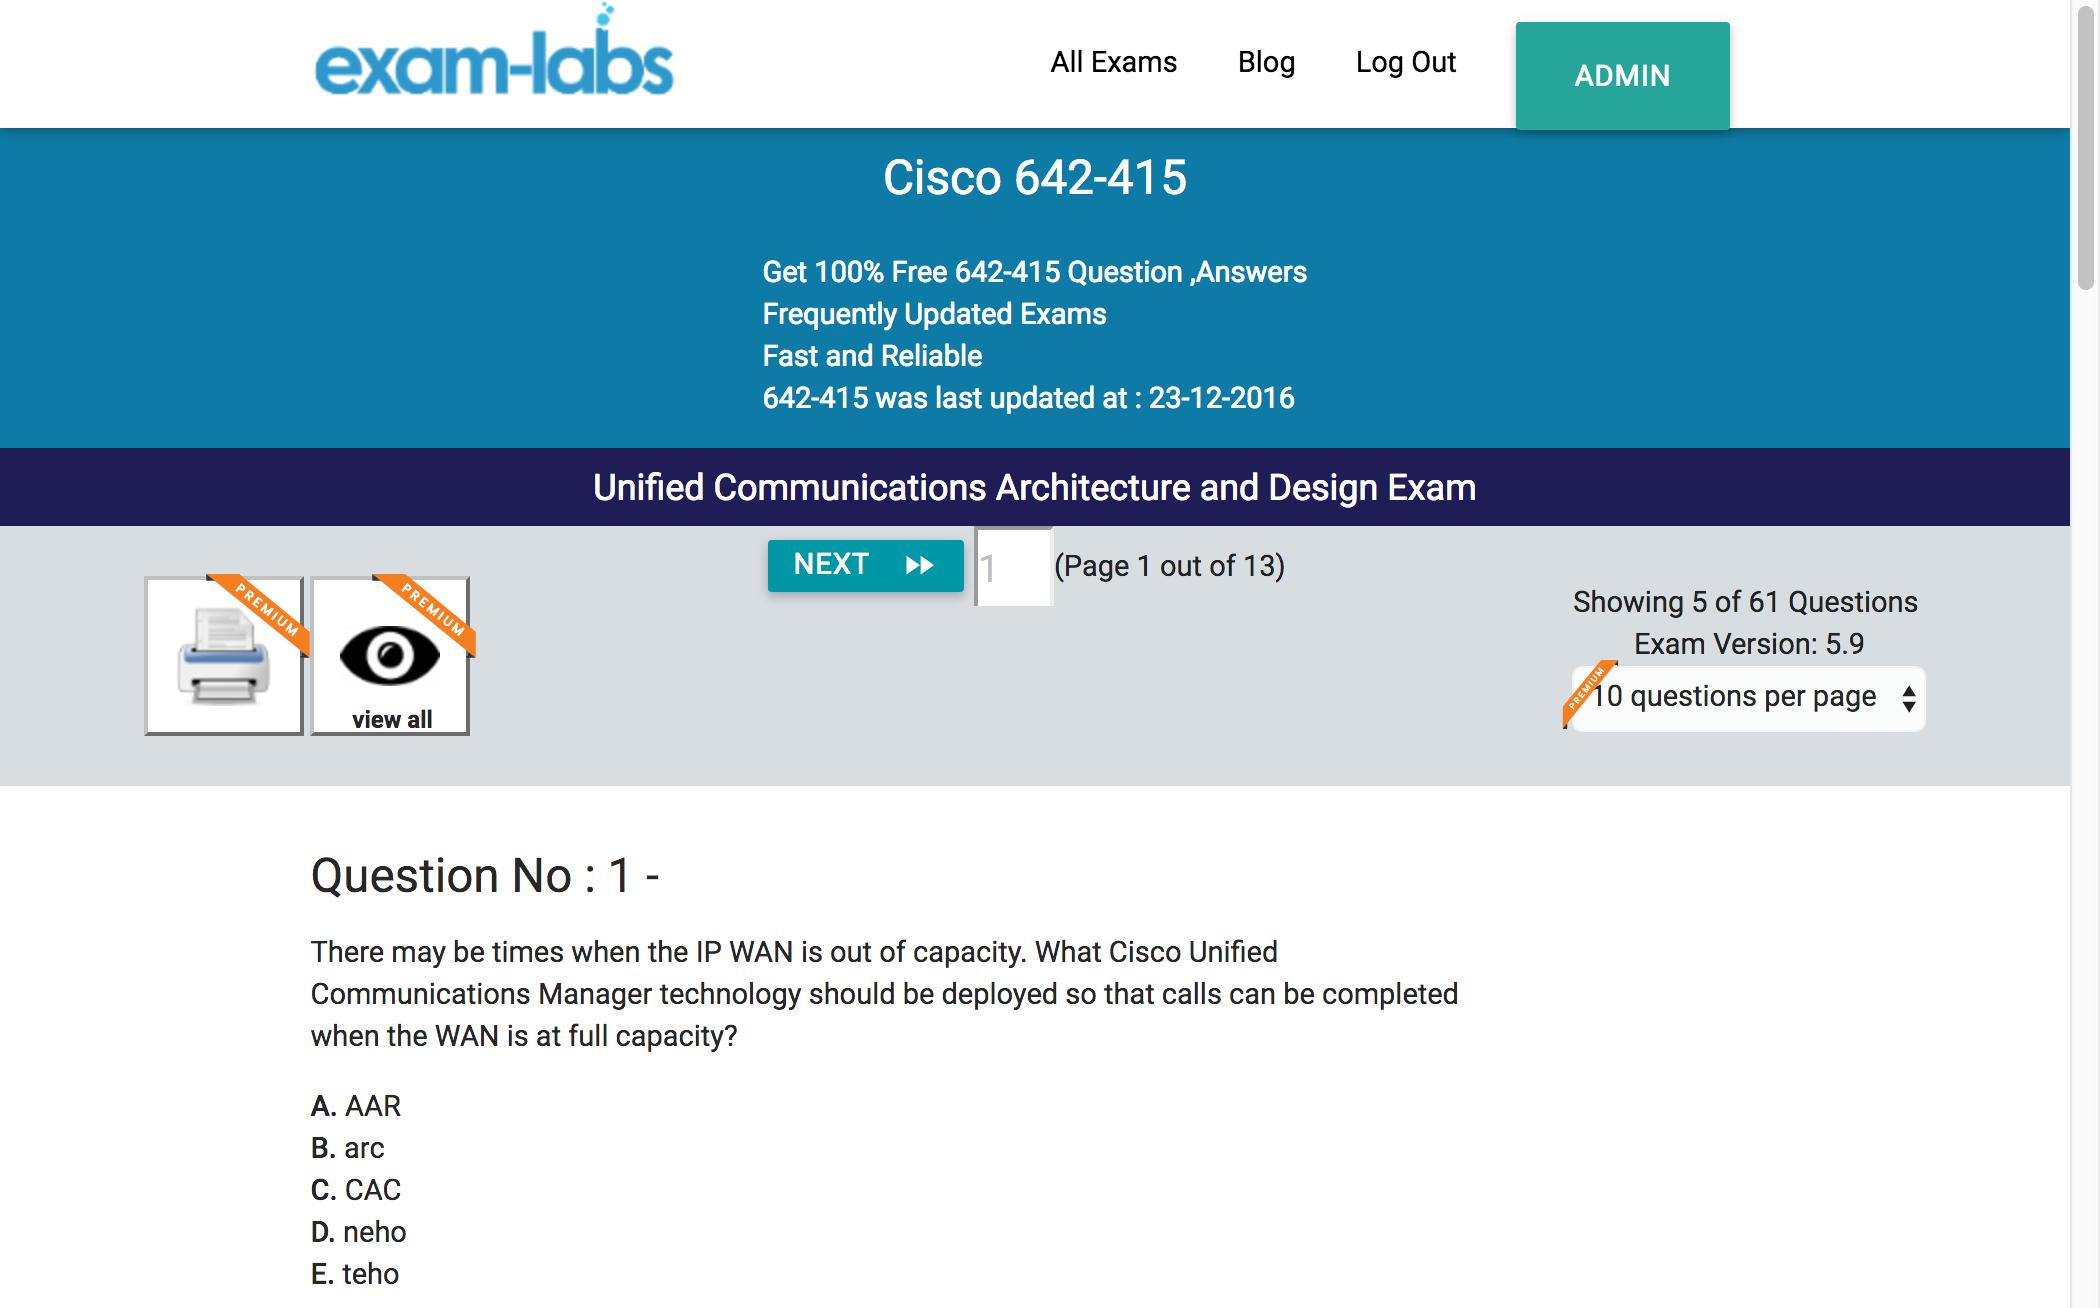 Architecture Design Exam 642-415 - cisco real exam questions - 100% free | exam-labs